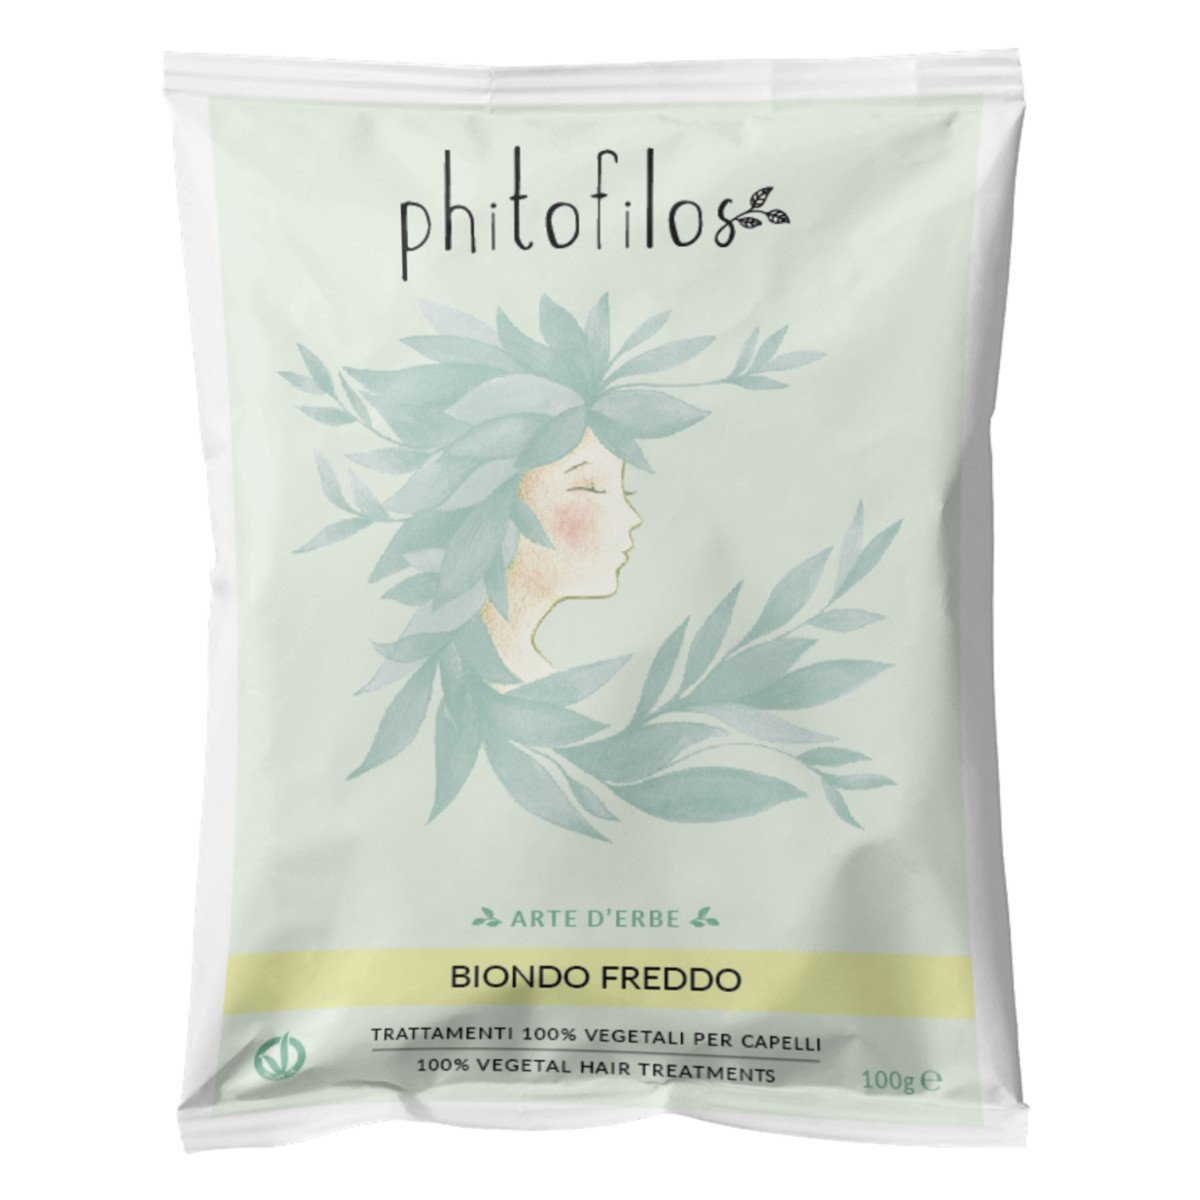 Miscela Biondo Freddo Phitofilos tintura riflessante naturale